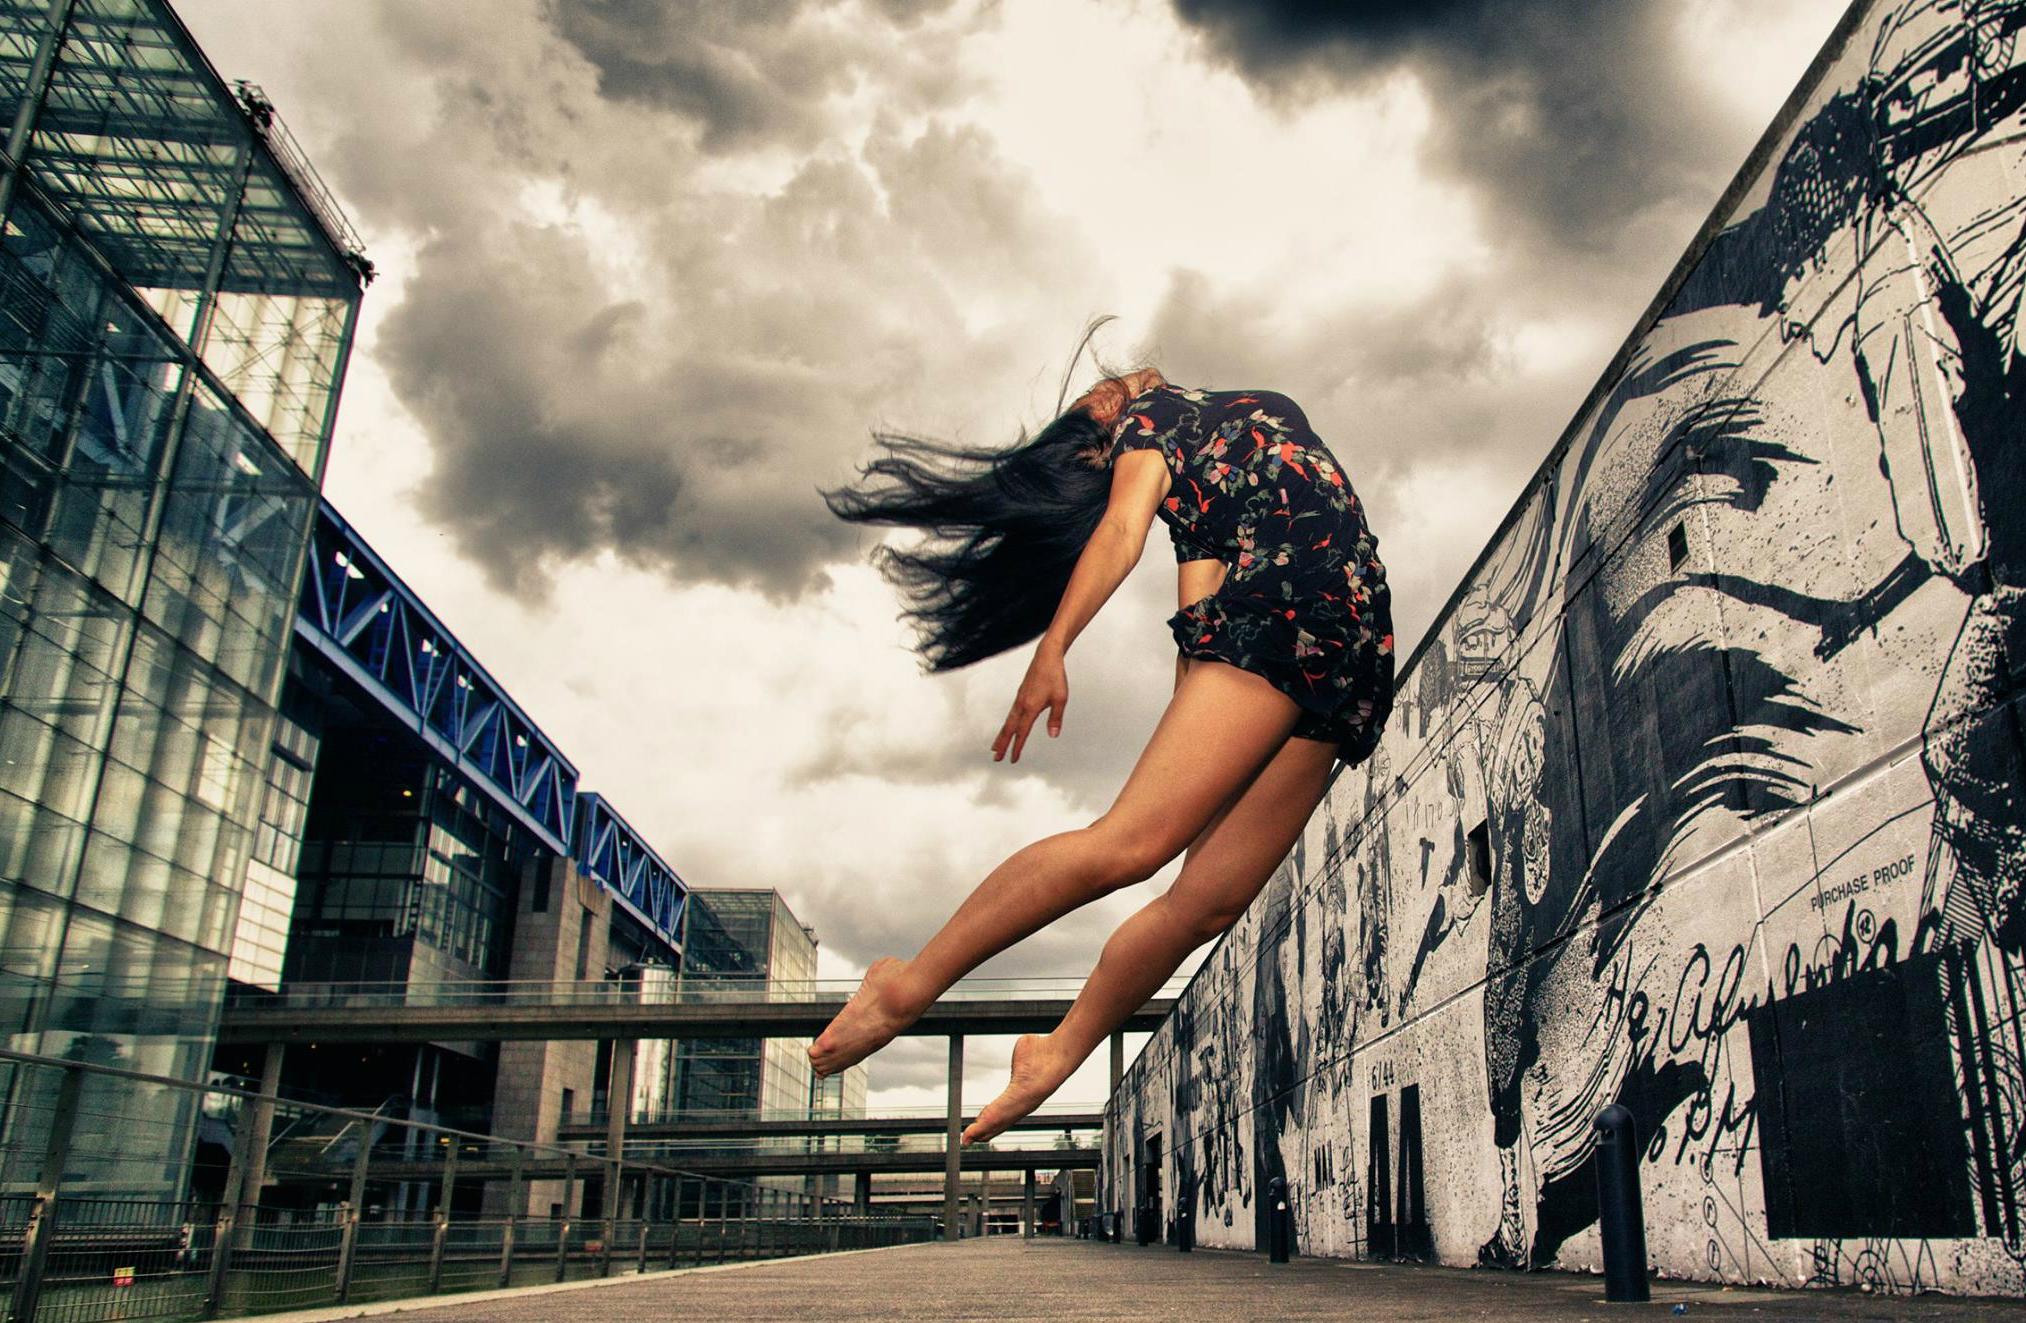 Yukiko Masui jump by Marso Riviere